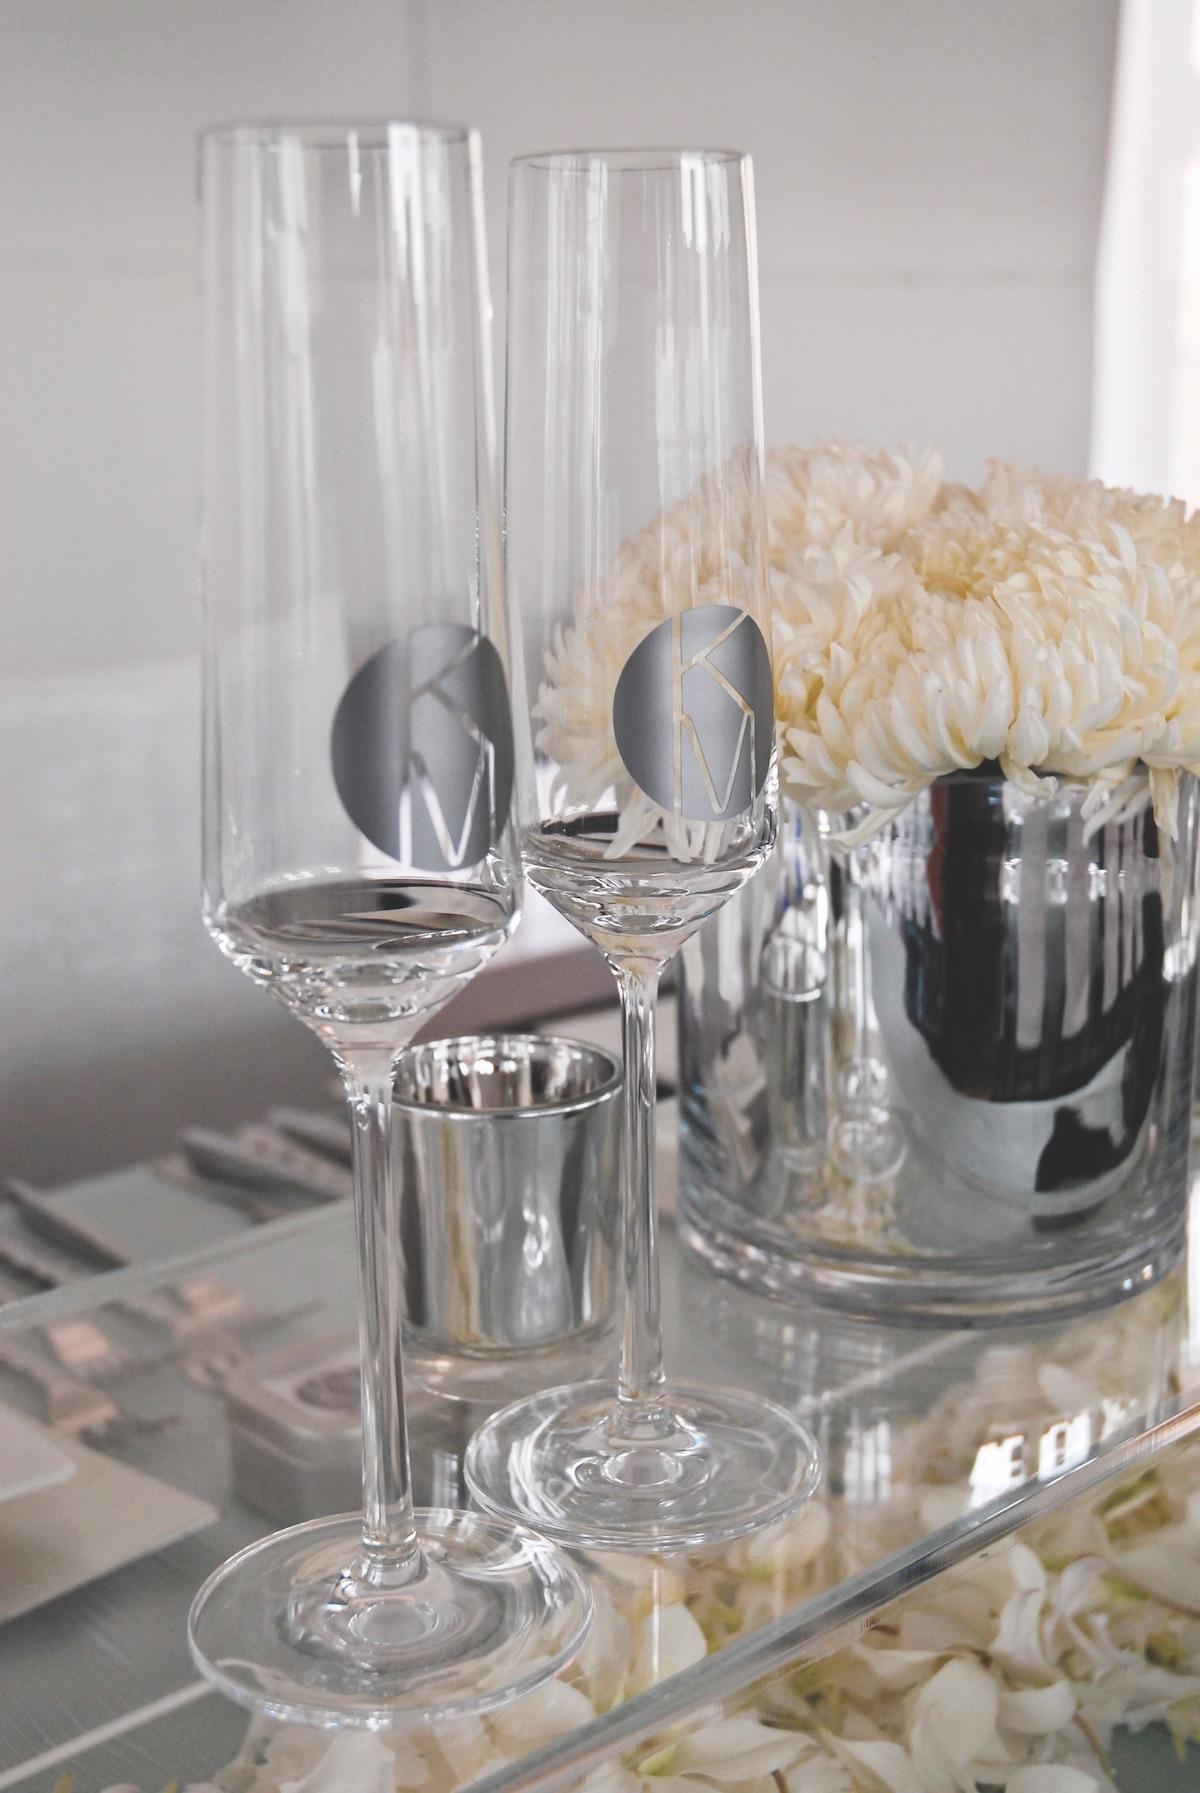 Modern art wedding champagne flutes with custom monogram